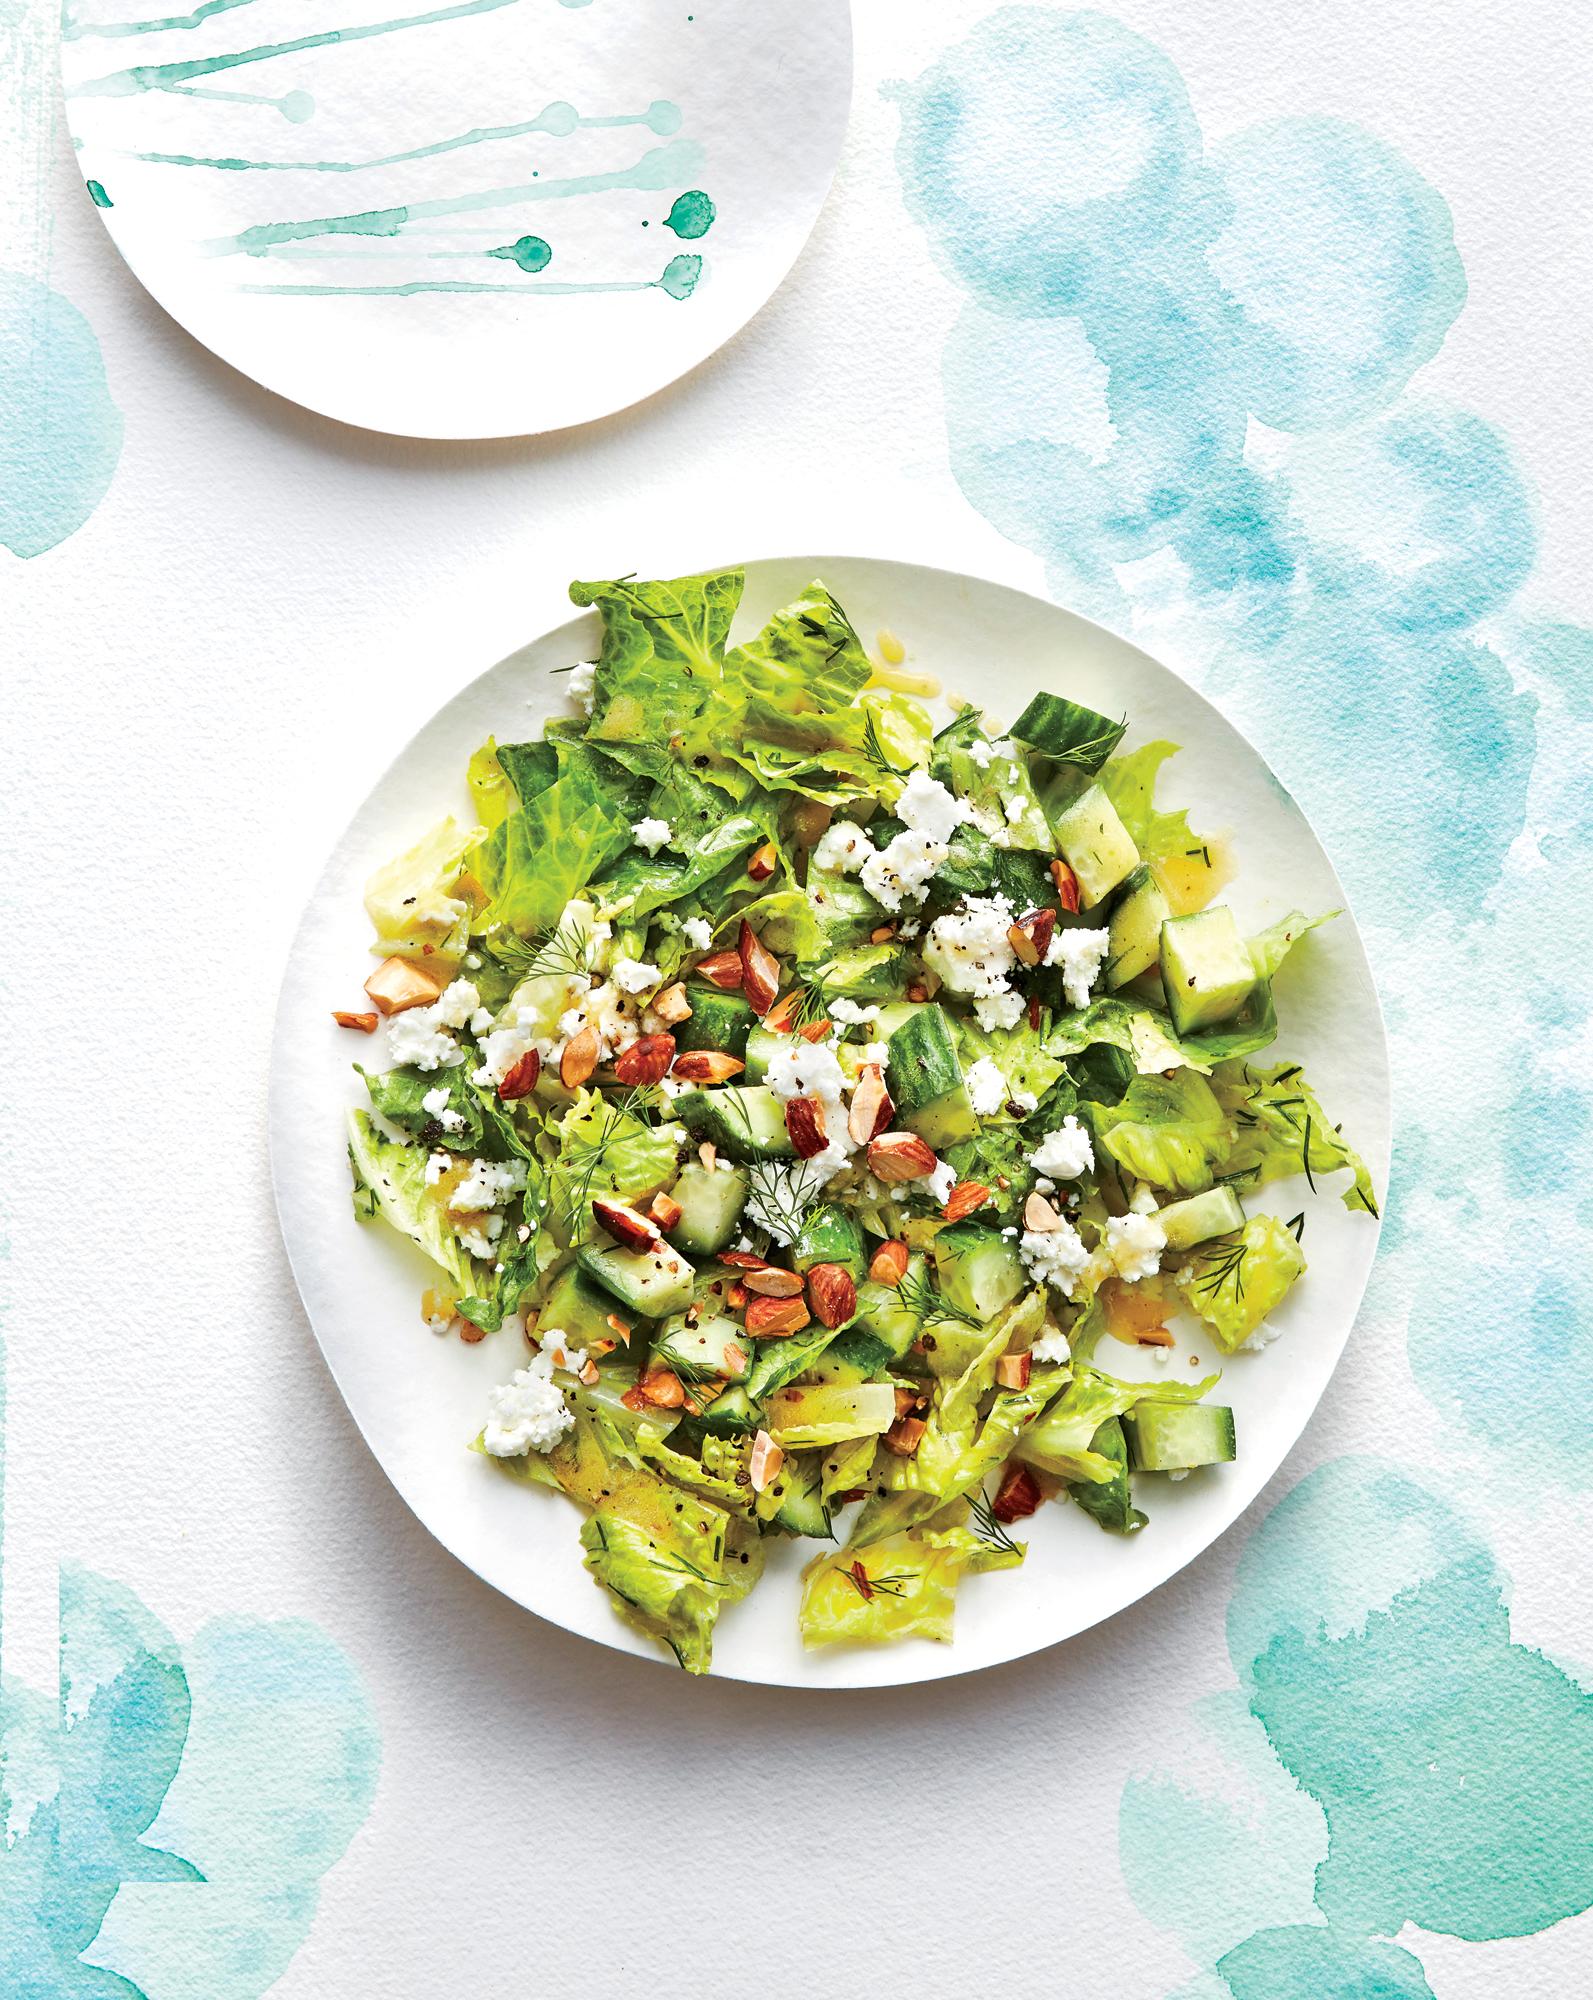 Crunchy Cucumber, Feta, and Almond Salad